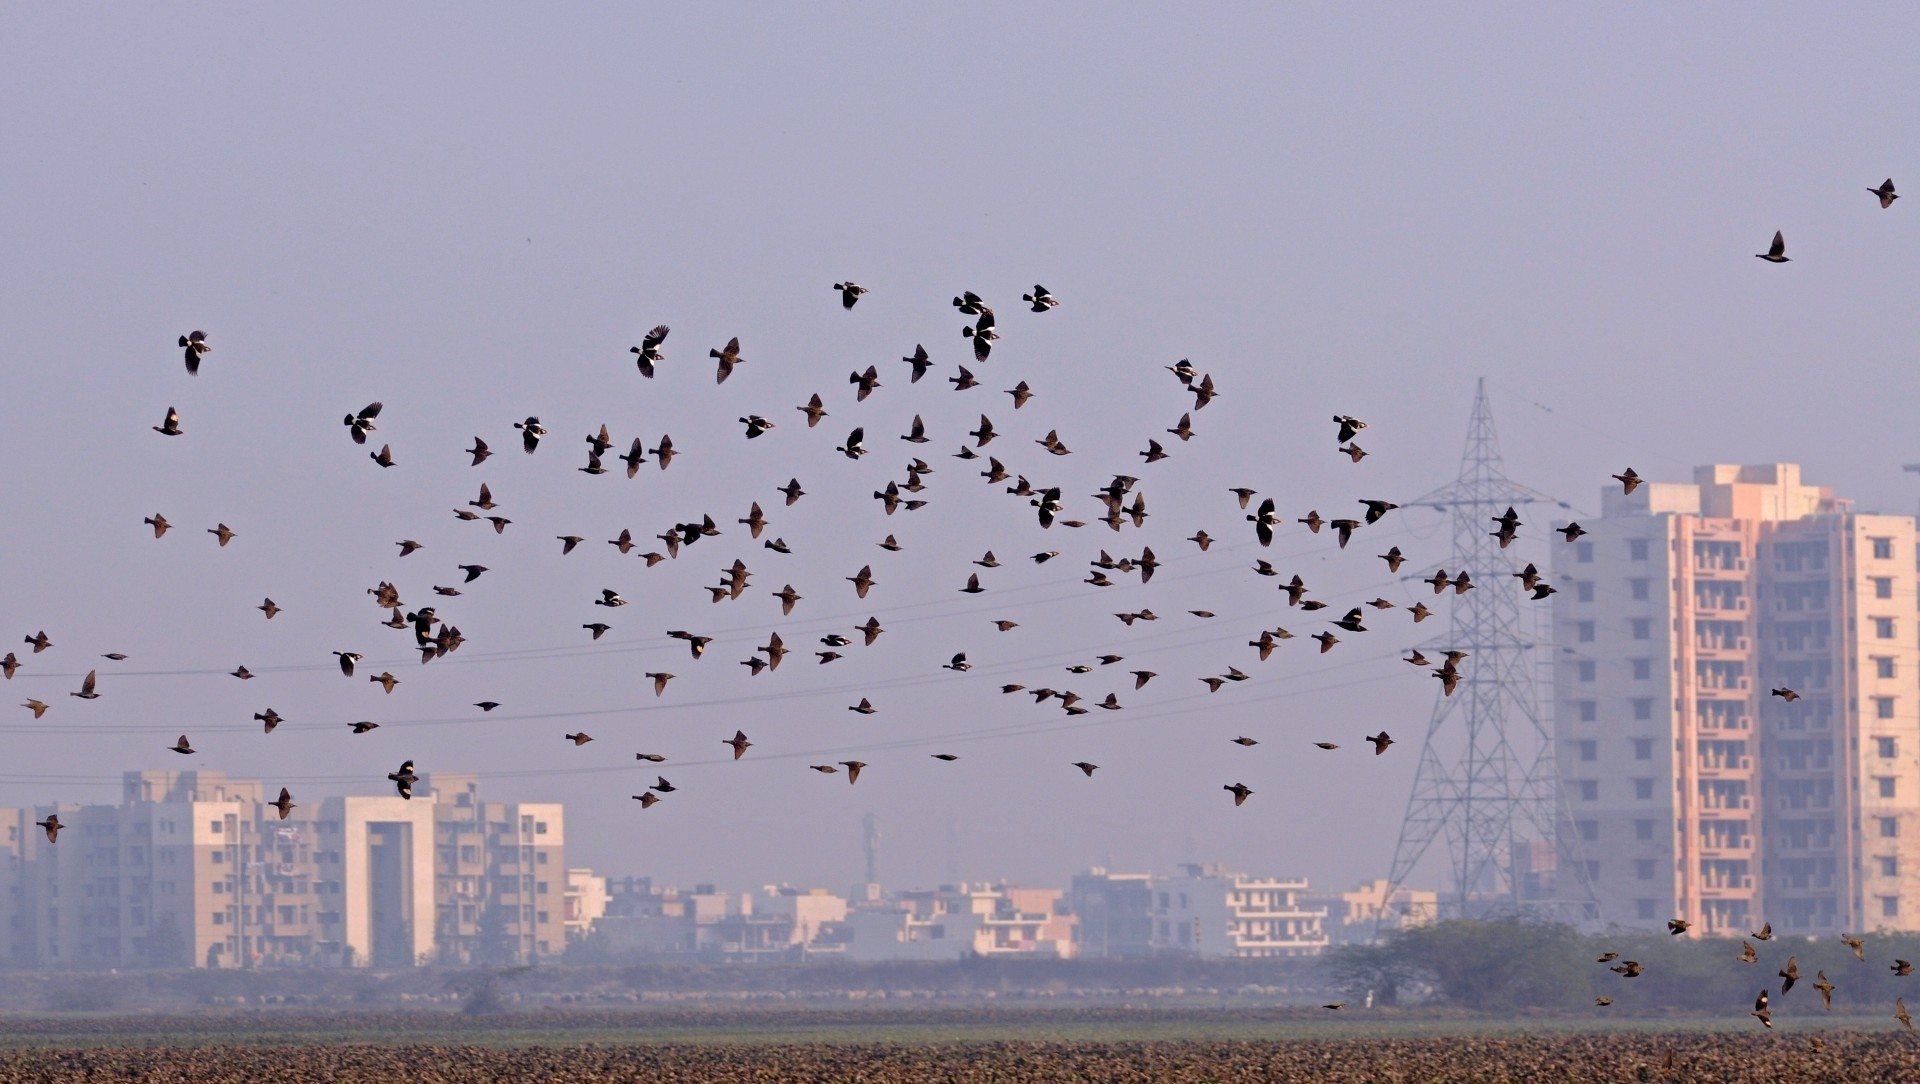 Basai Wetland Thrives Just a Short Hop From Gurugram's Glitzy Malls